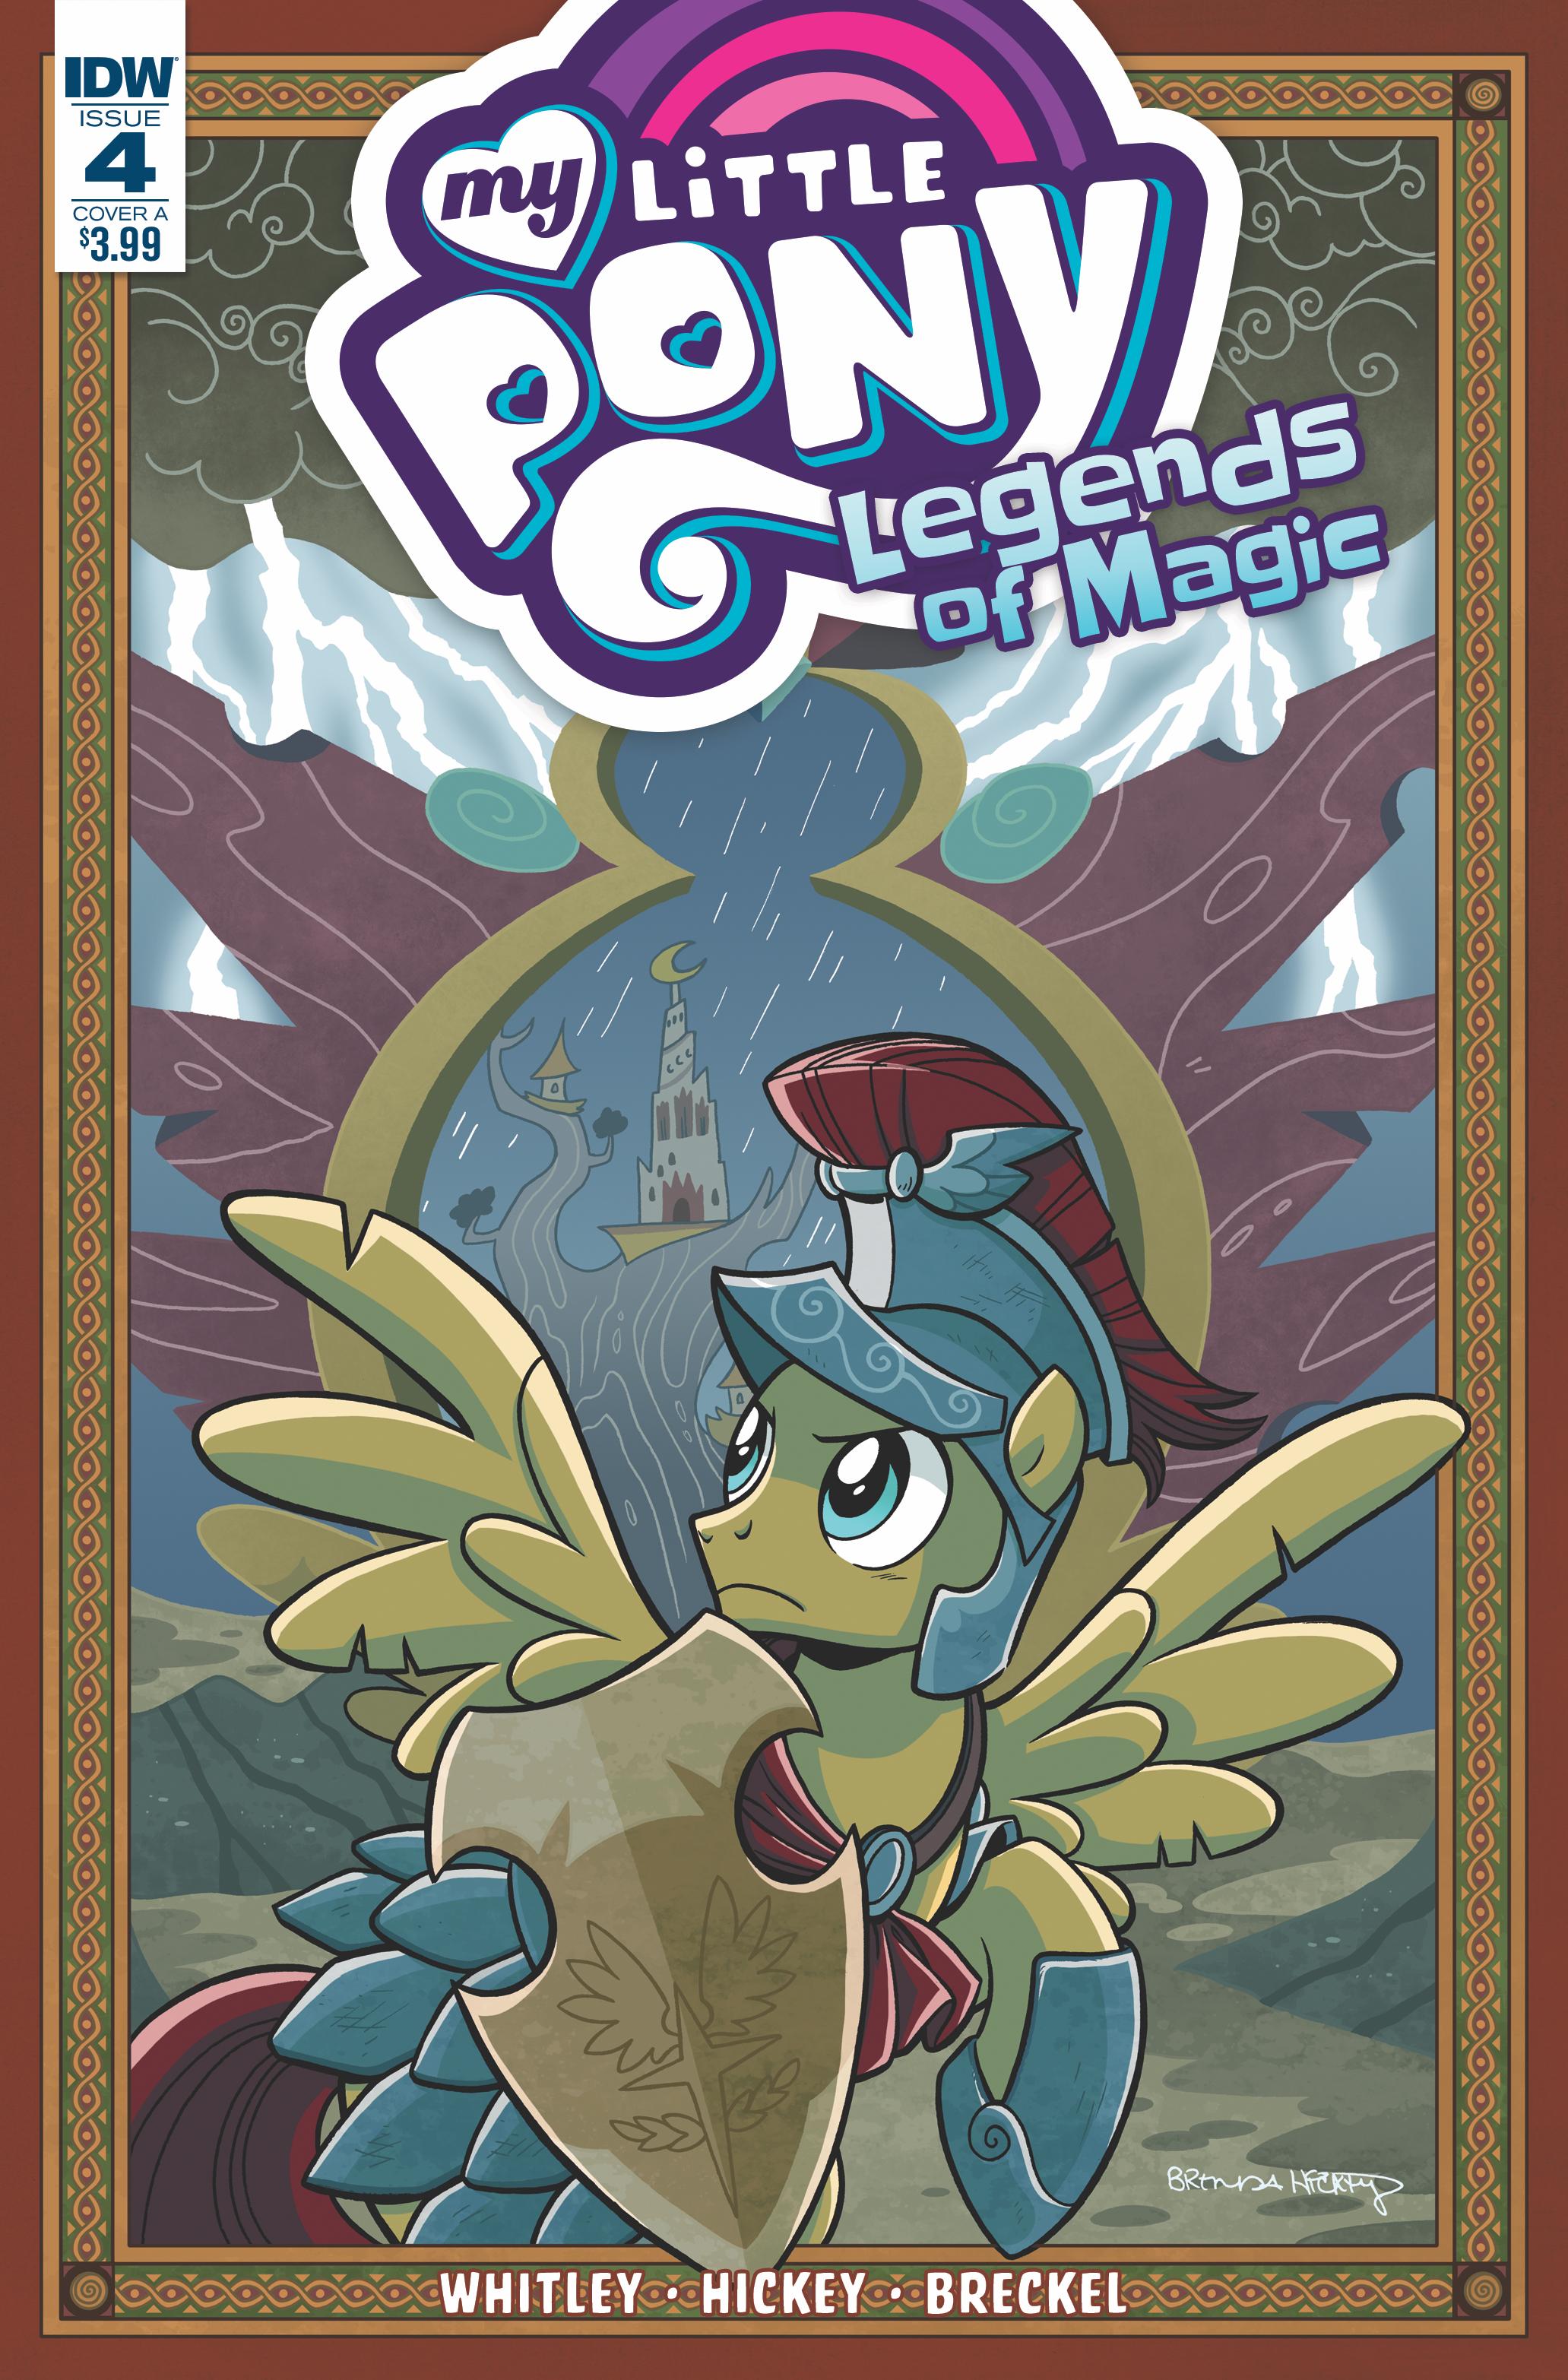 Legends of Magic Issue 4